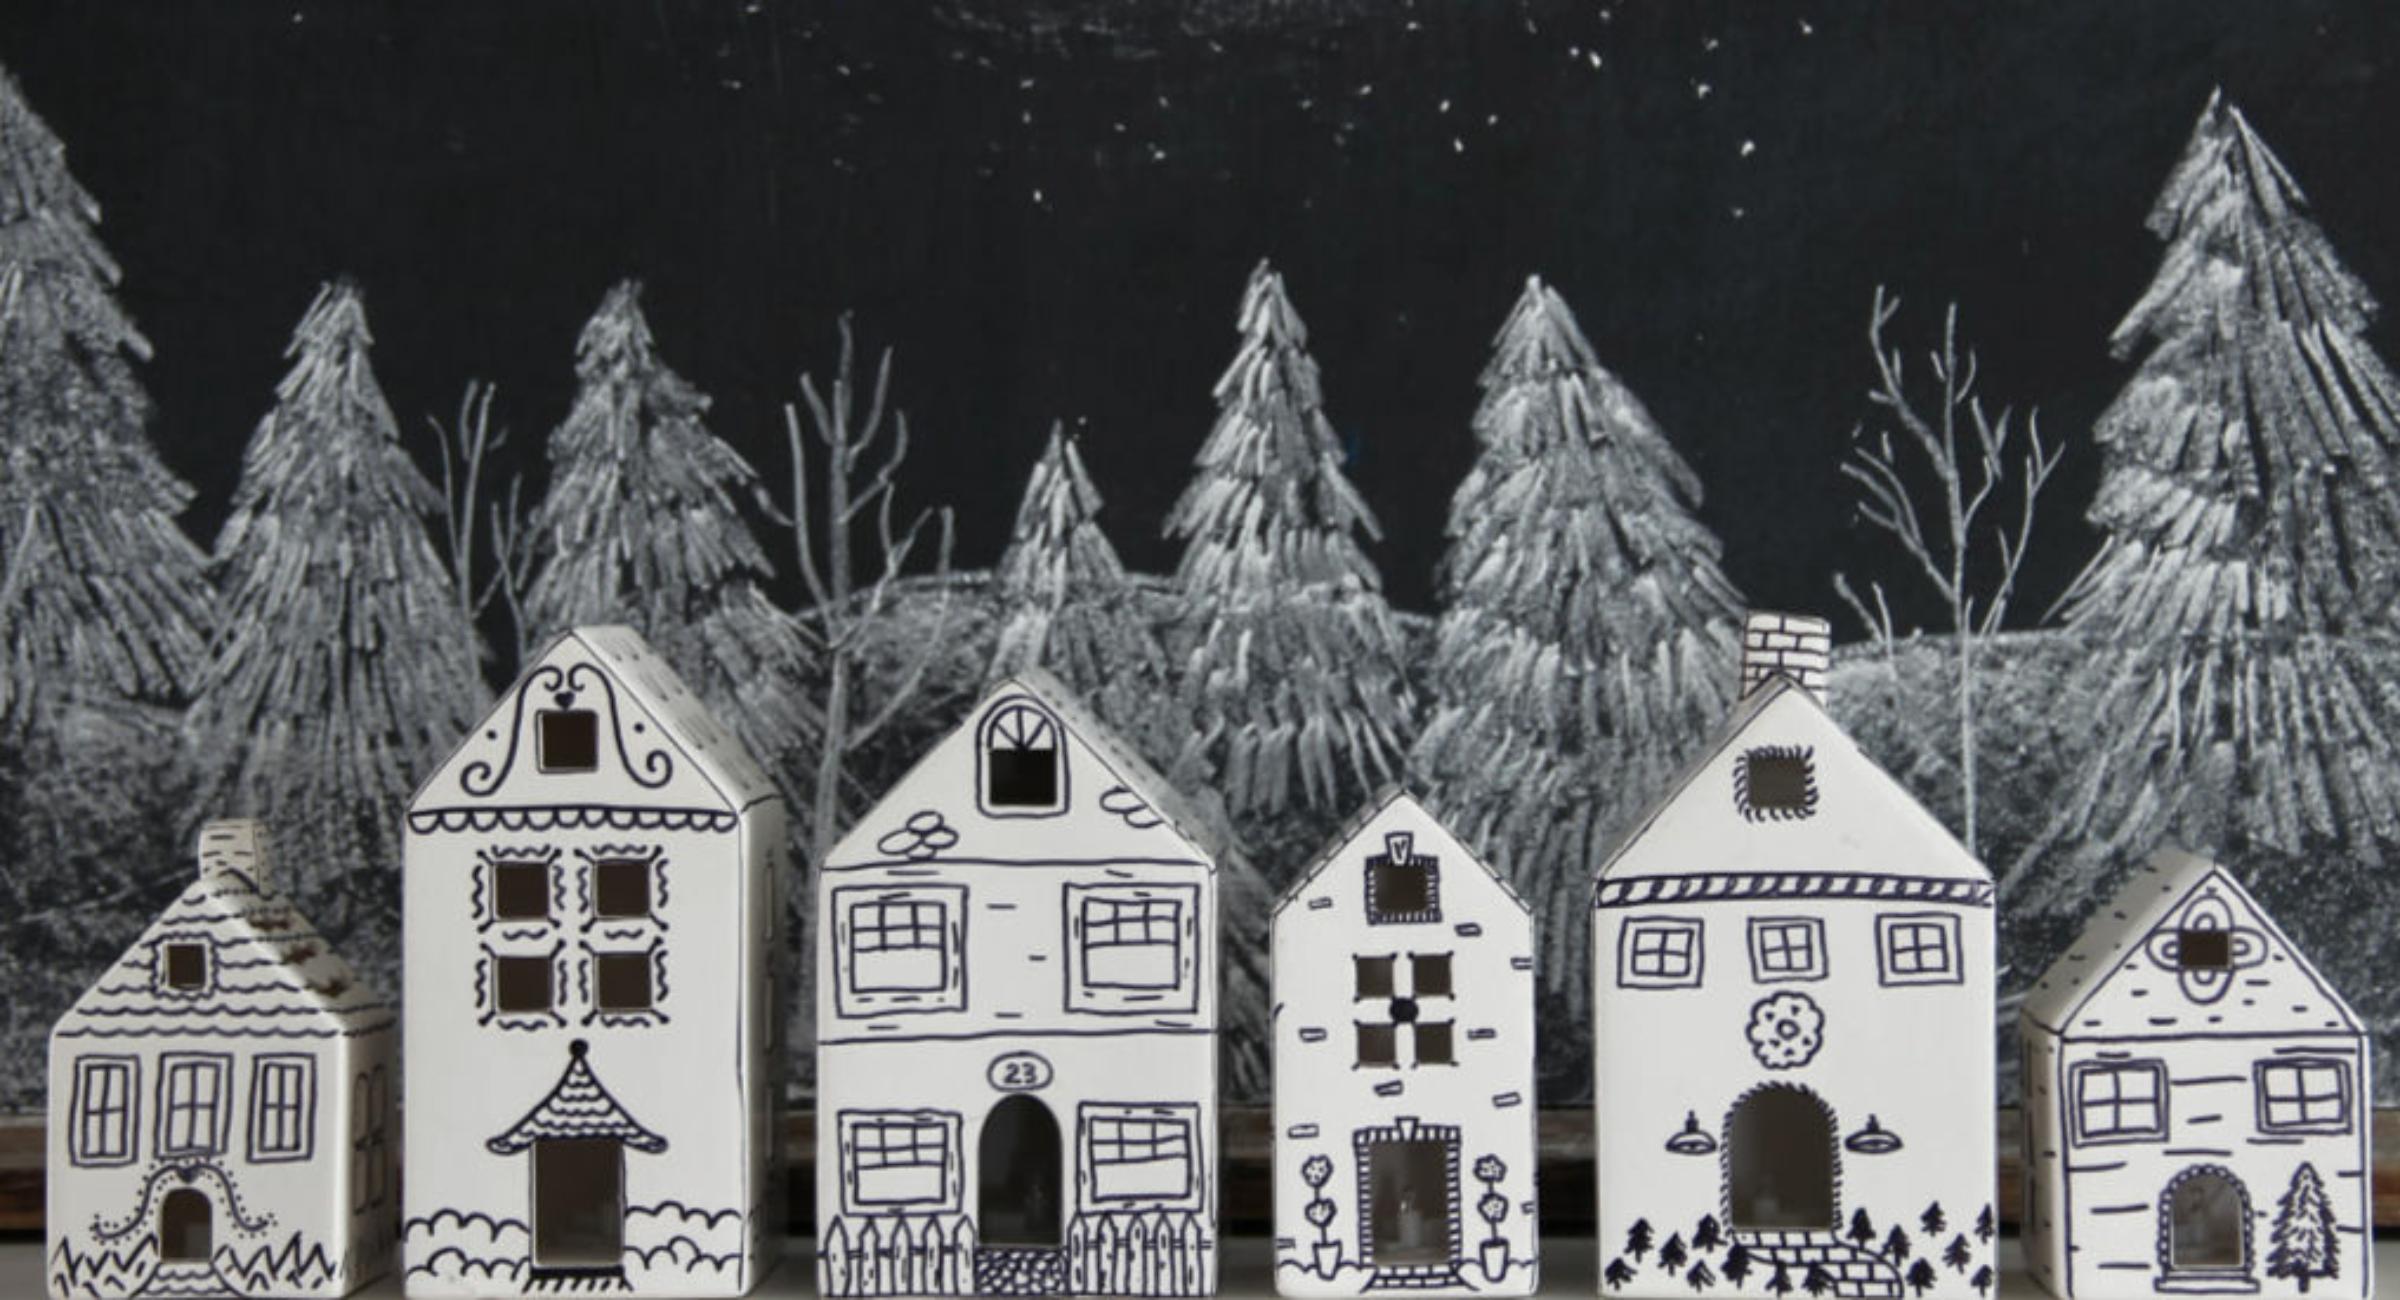 DIY-Doodle-Houses-Ceramic-Houses-Christmas (1)